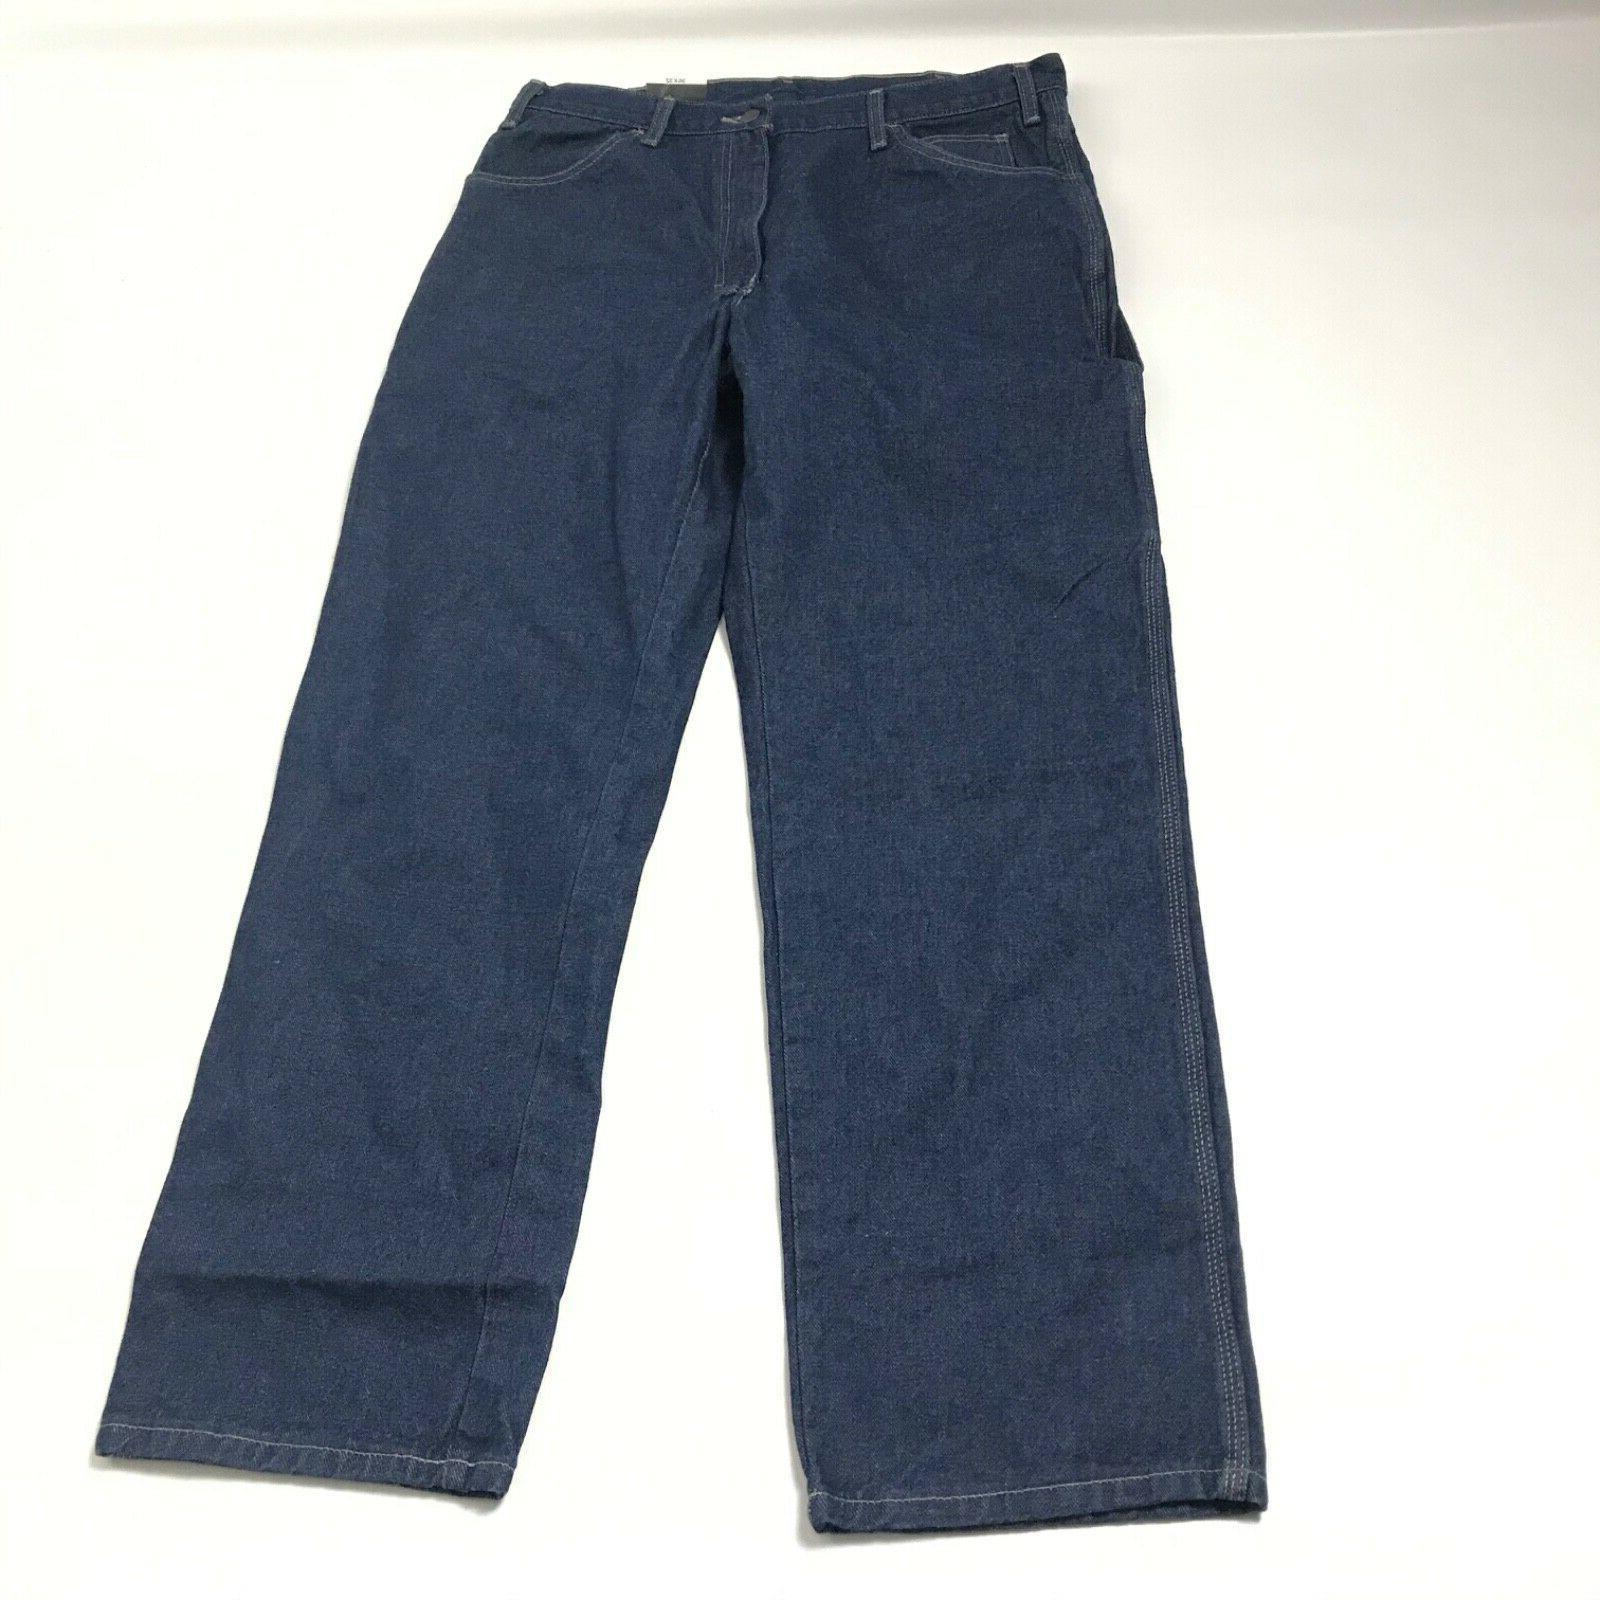 nwt industrial carpenter jeans rinsed indigo blue